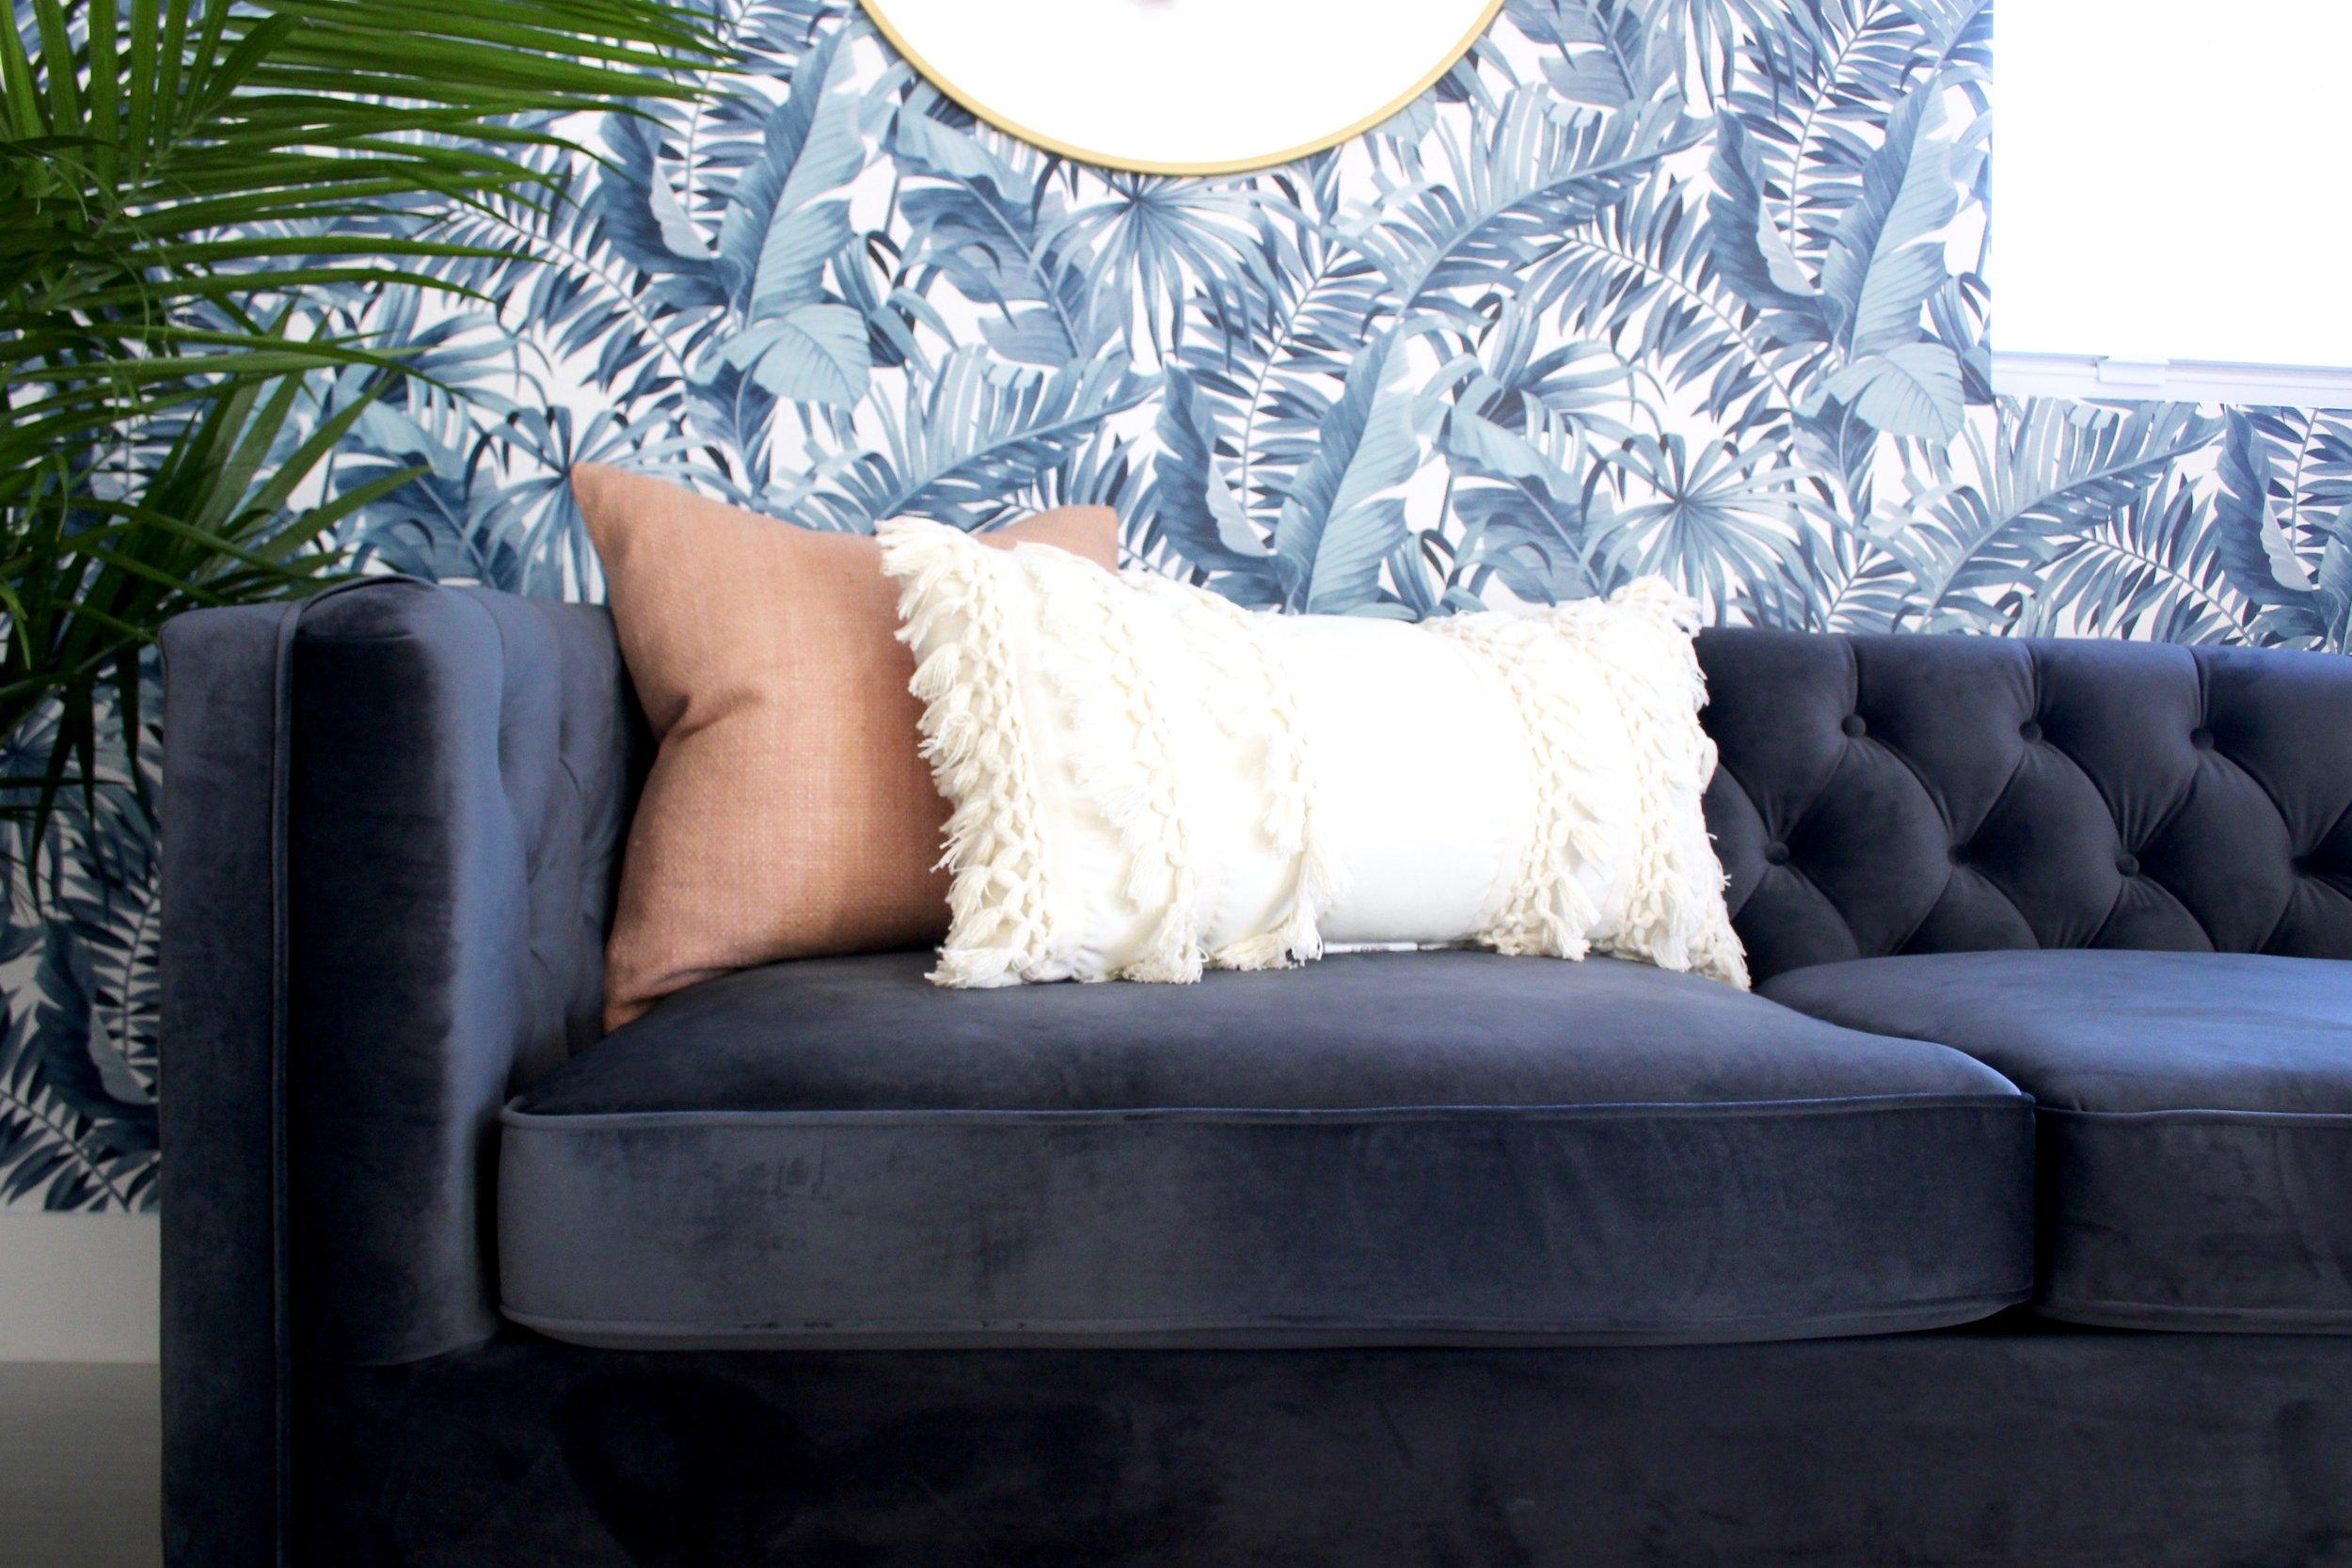 whimsical wynwood studio - velvet sofa - miami interior design - the habitat collective